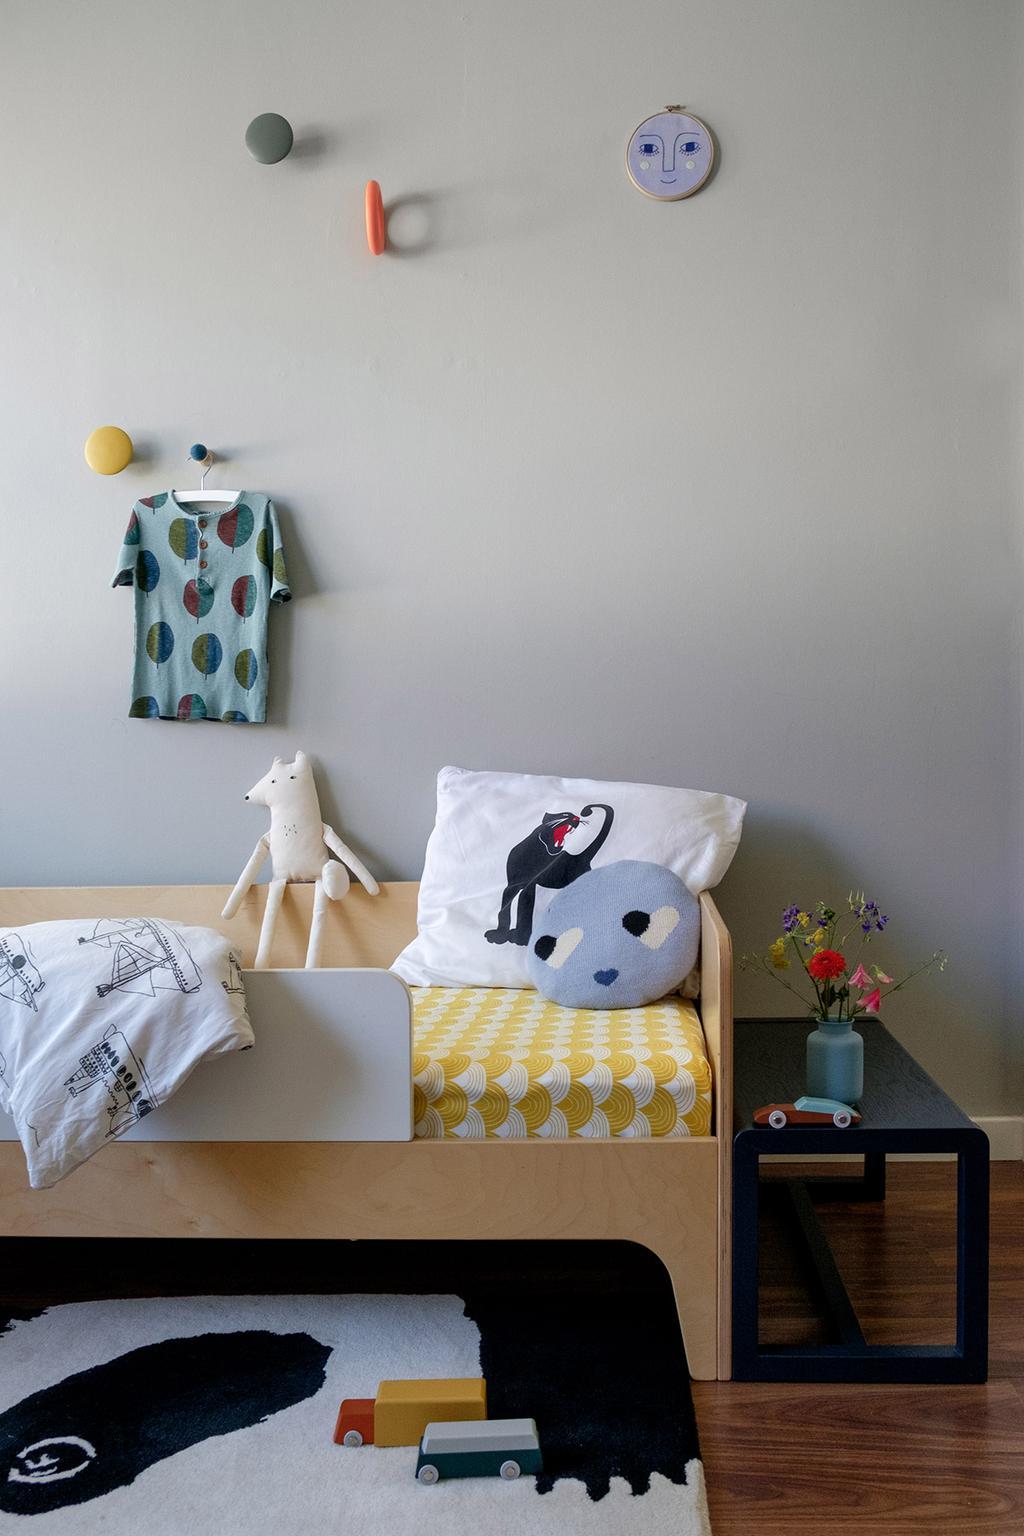 Kinderkamer met geel beddengoed van Swedish Linens